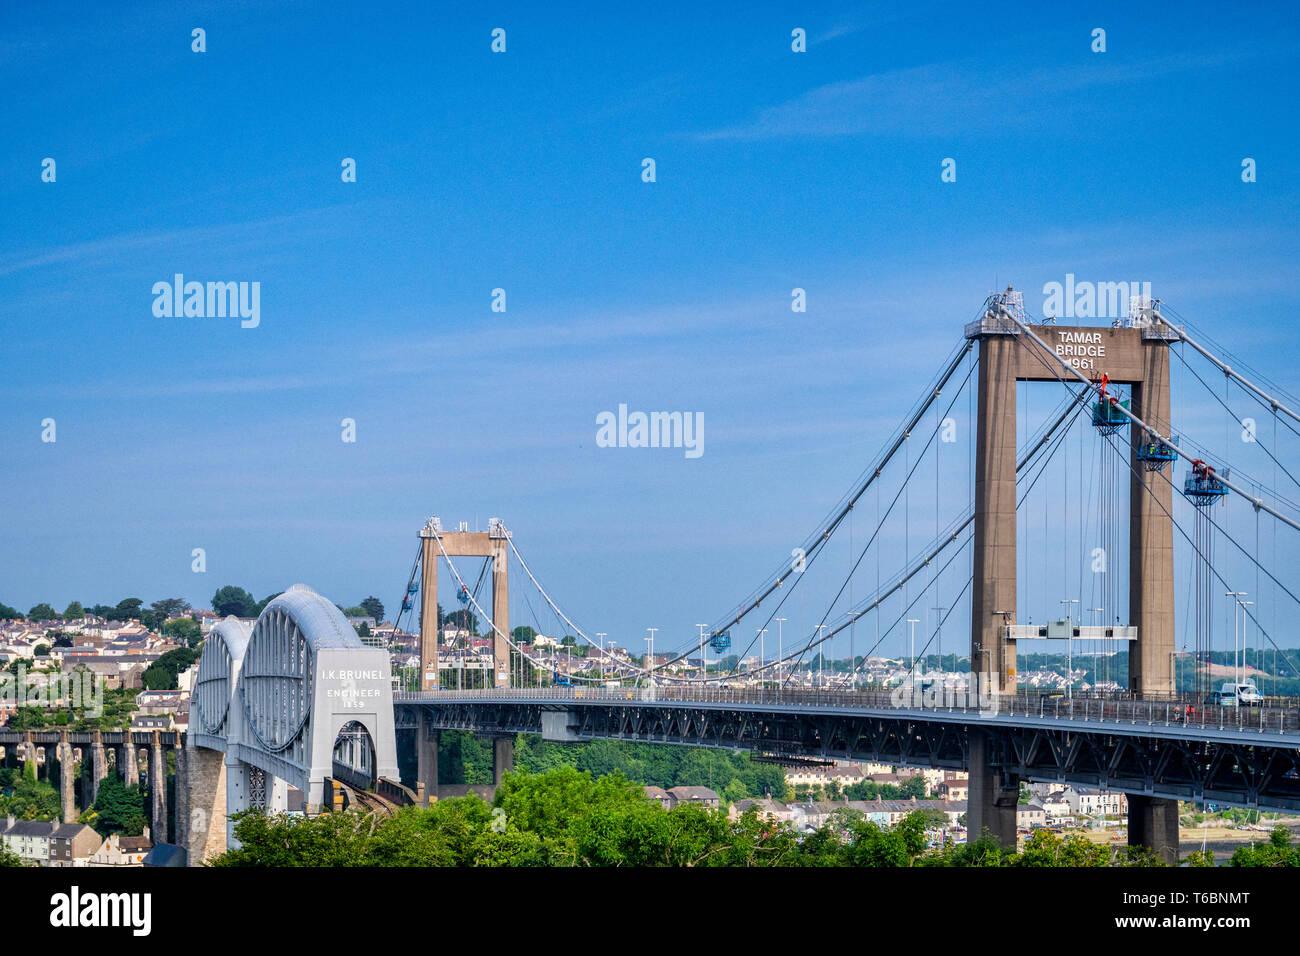 The Royal Albert Railway Bridge and beside it the Tamar Road Bridge, Saltash, Plymouth, Devon, UK Stock Photo